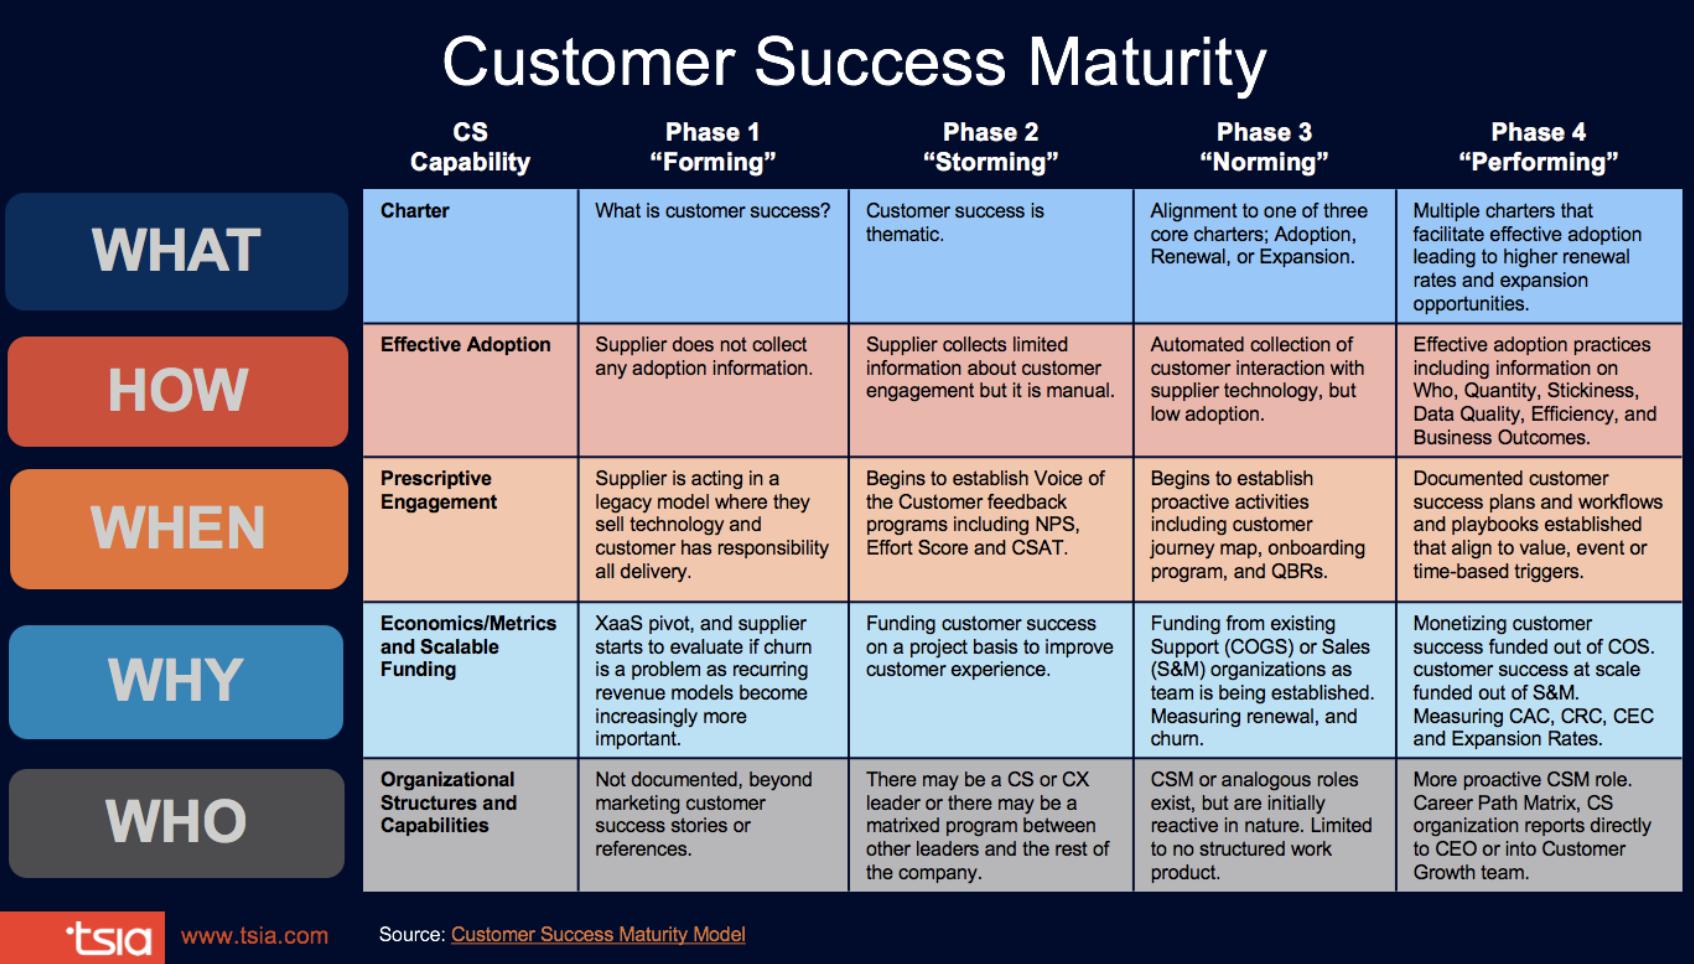 TSIA Customer Success Maturity Model